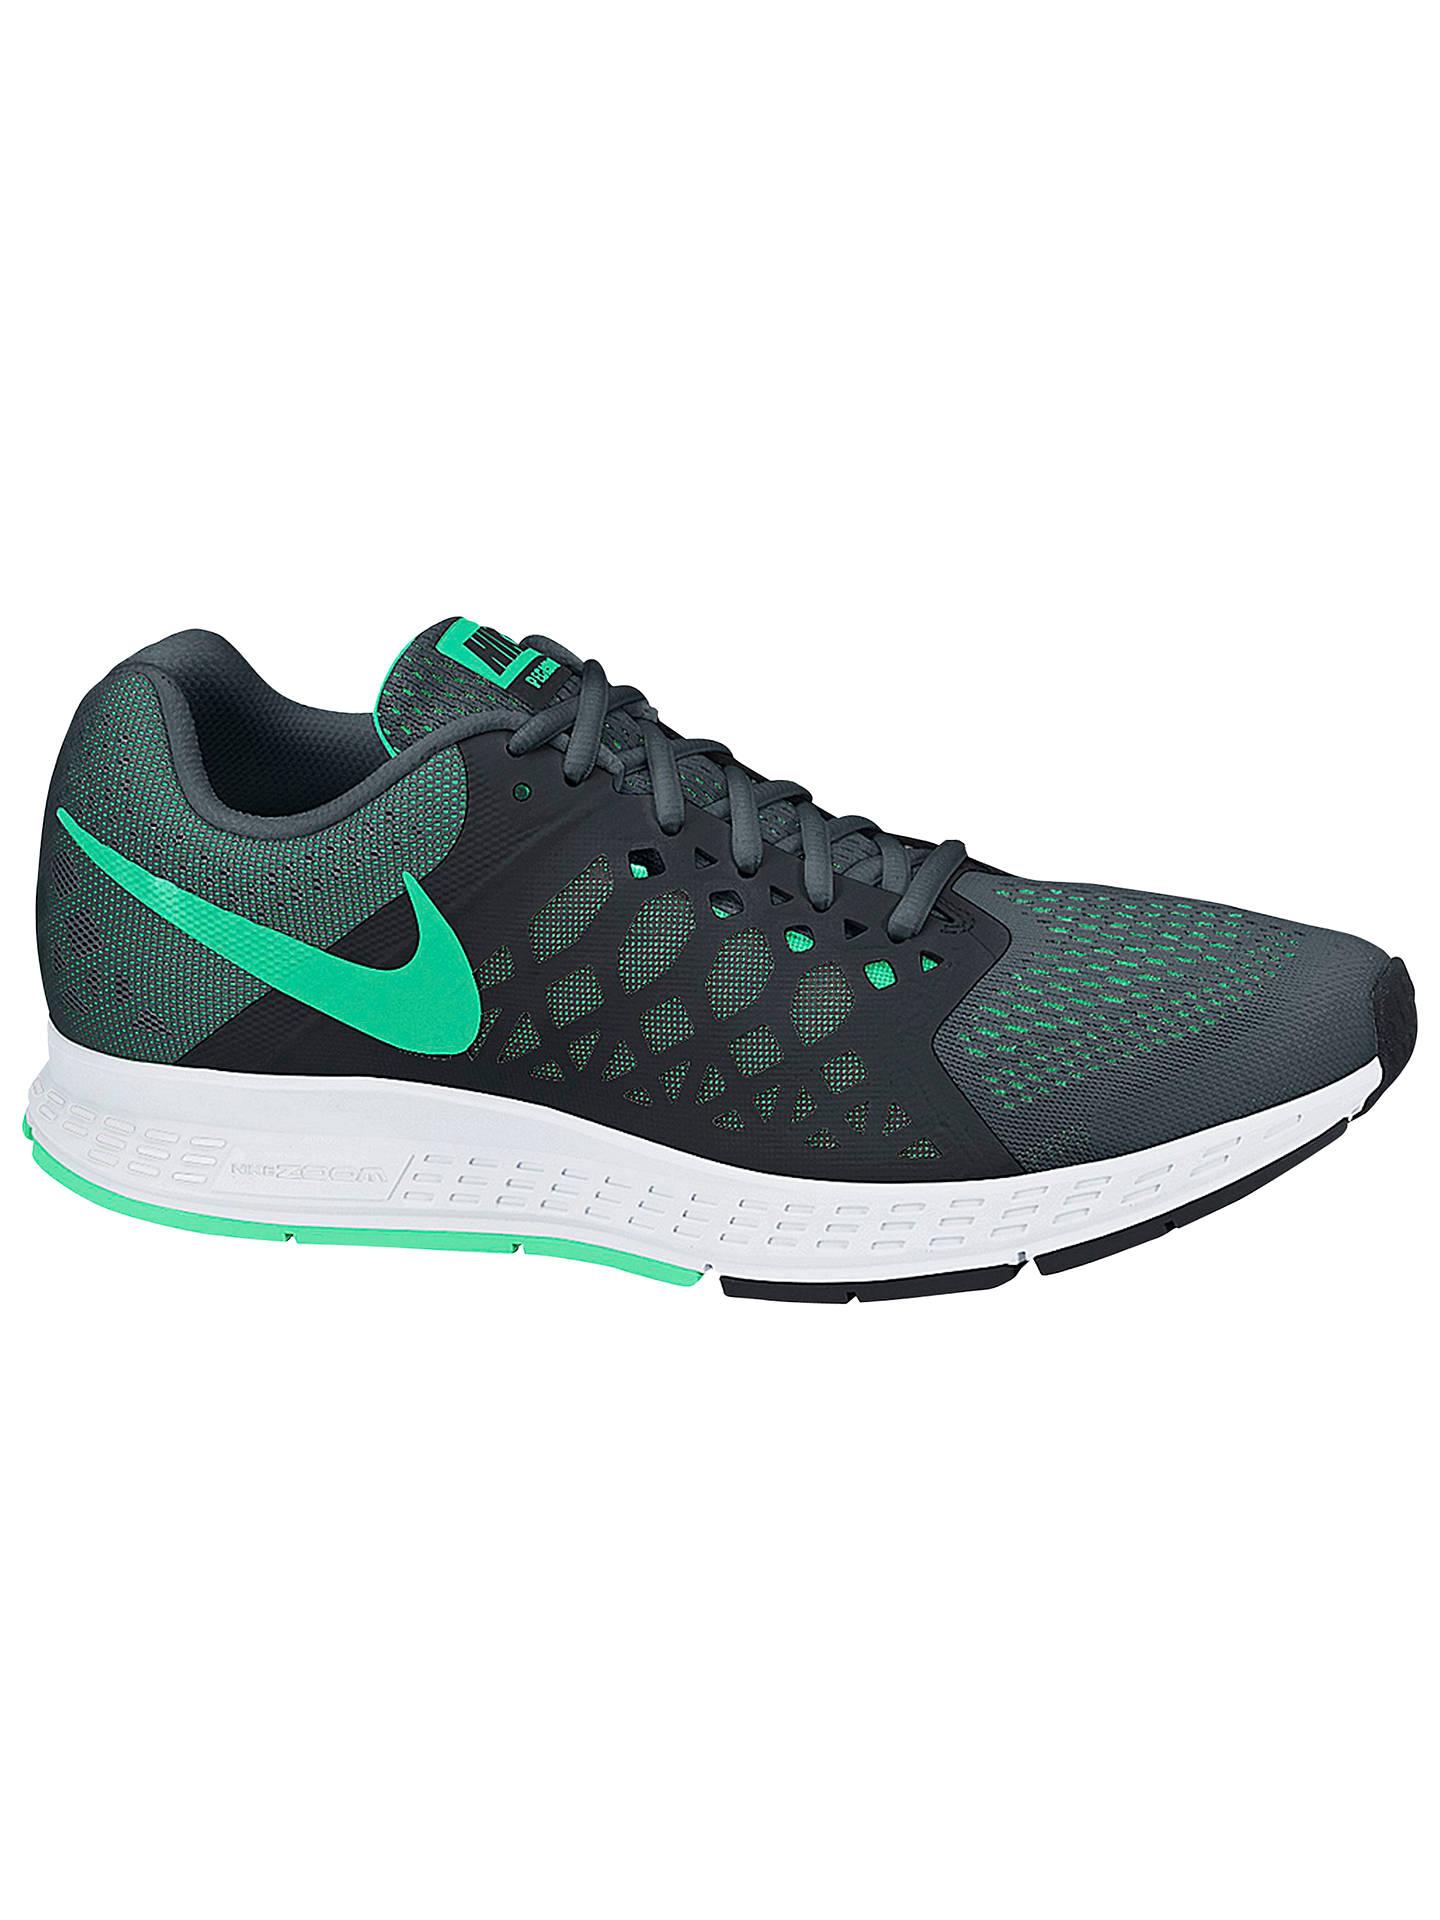 new style 79779 1c866 Buy Nike Air Zoom Pegasus 31 Women s Running Shoes, Green Black, 4 Online  ...